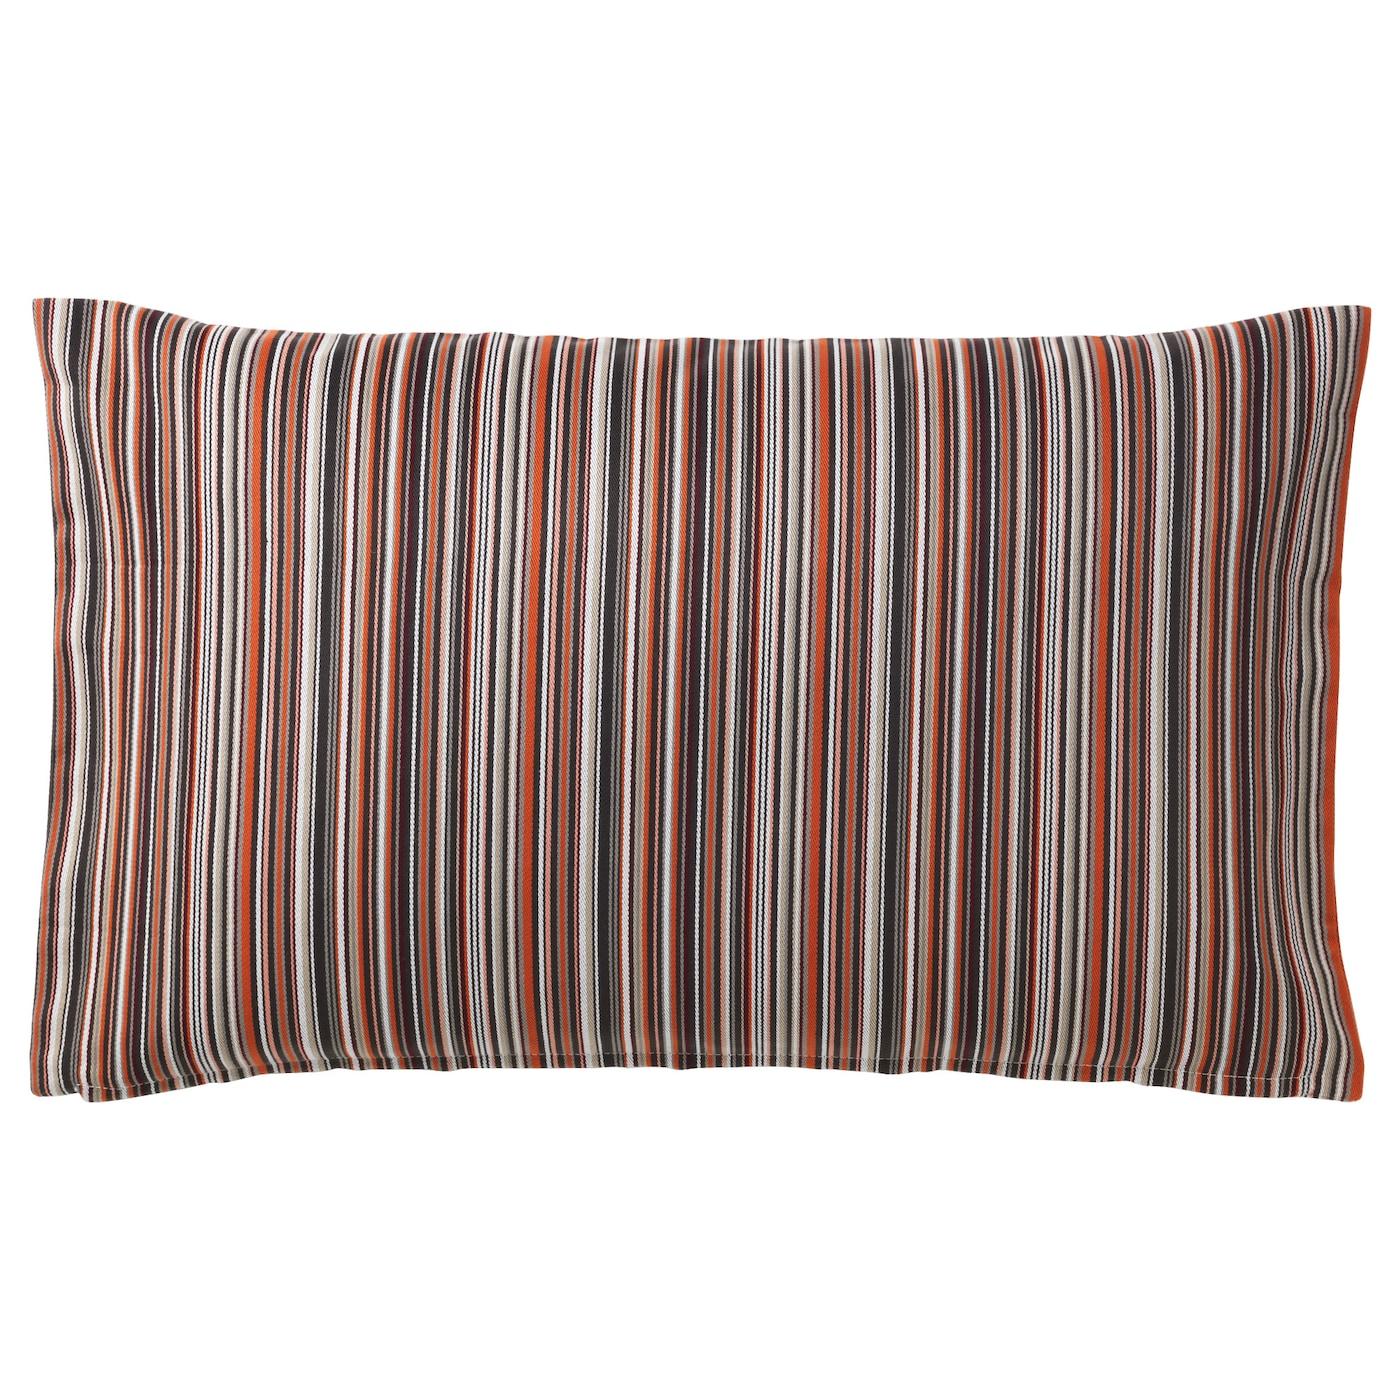 coussins et housses de coussins coussins et housses ikea. Black Bedroom Furniture Sets. Home Design Ideas